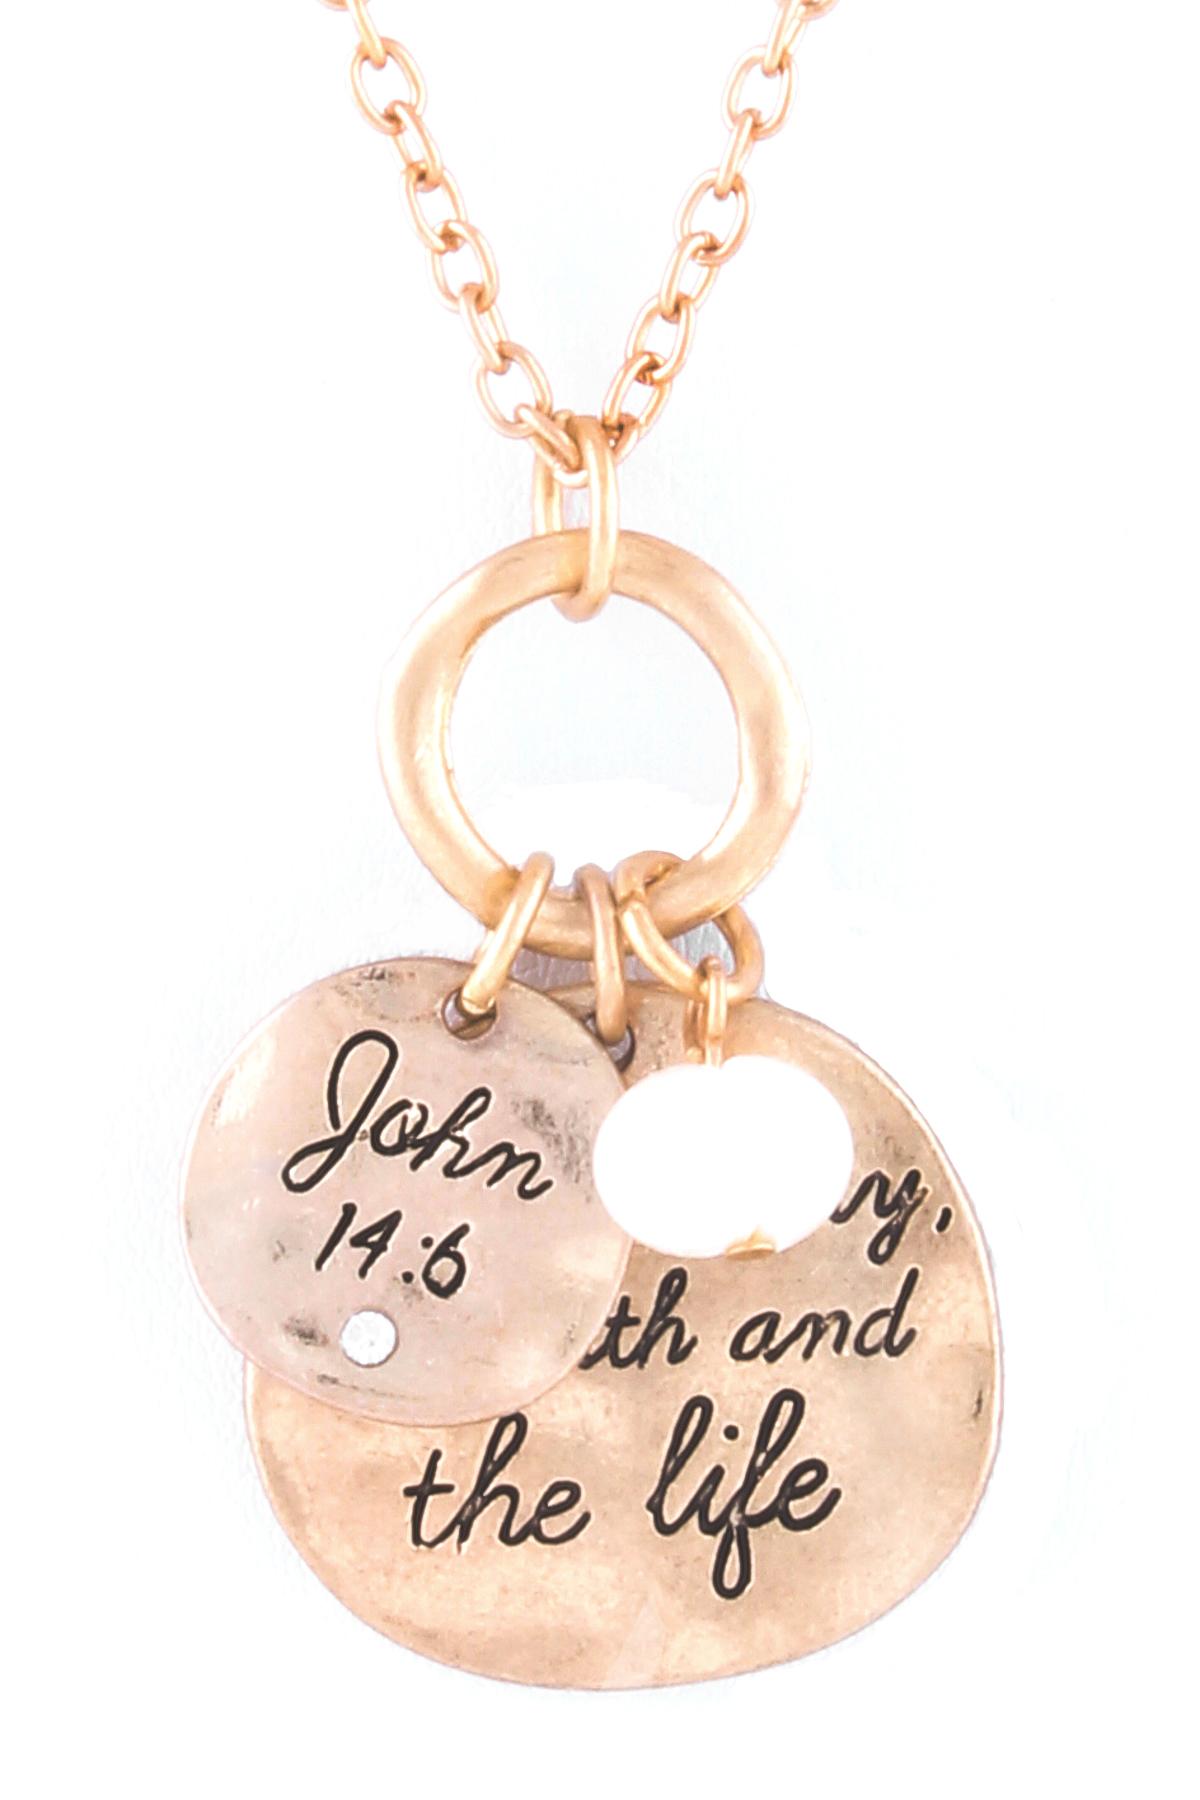 john 14 6 pendant necklace set